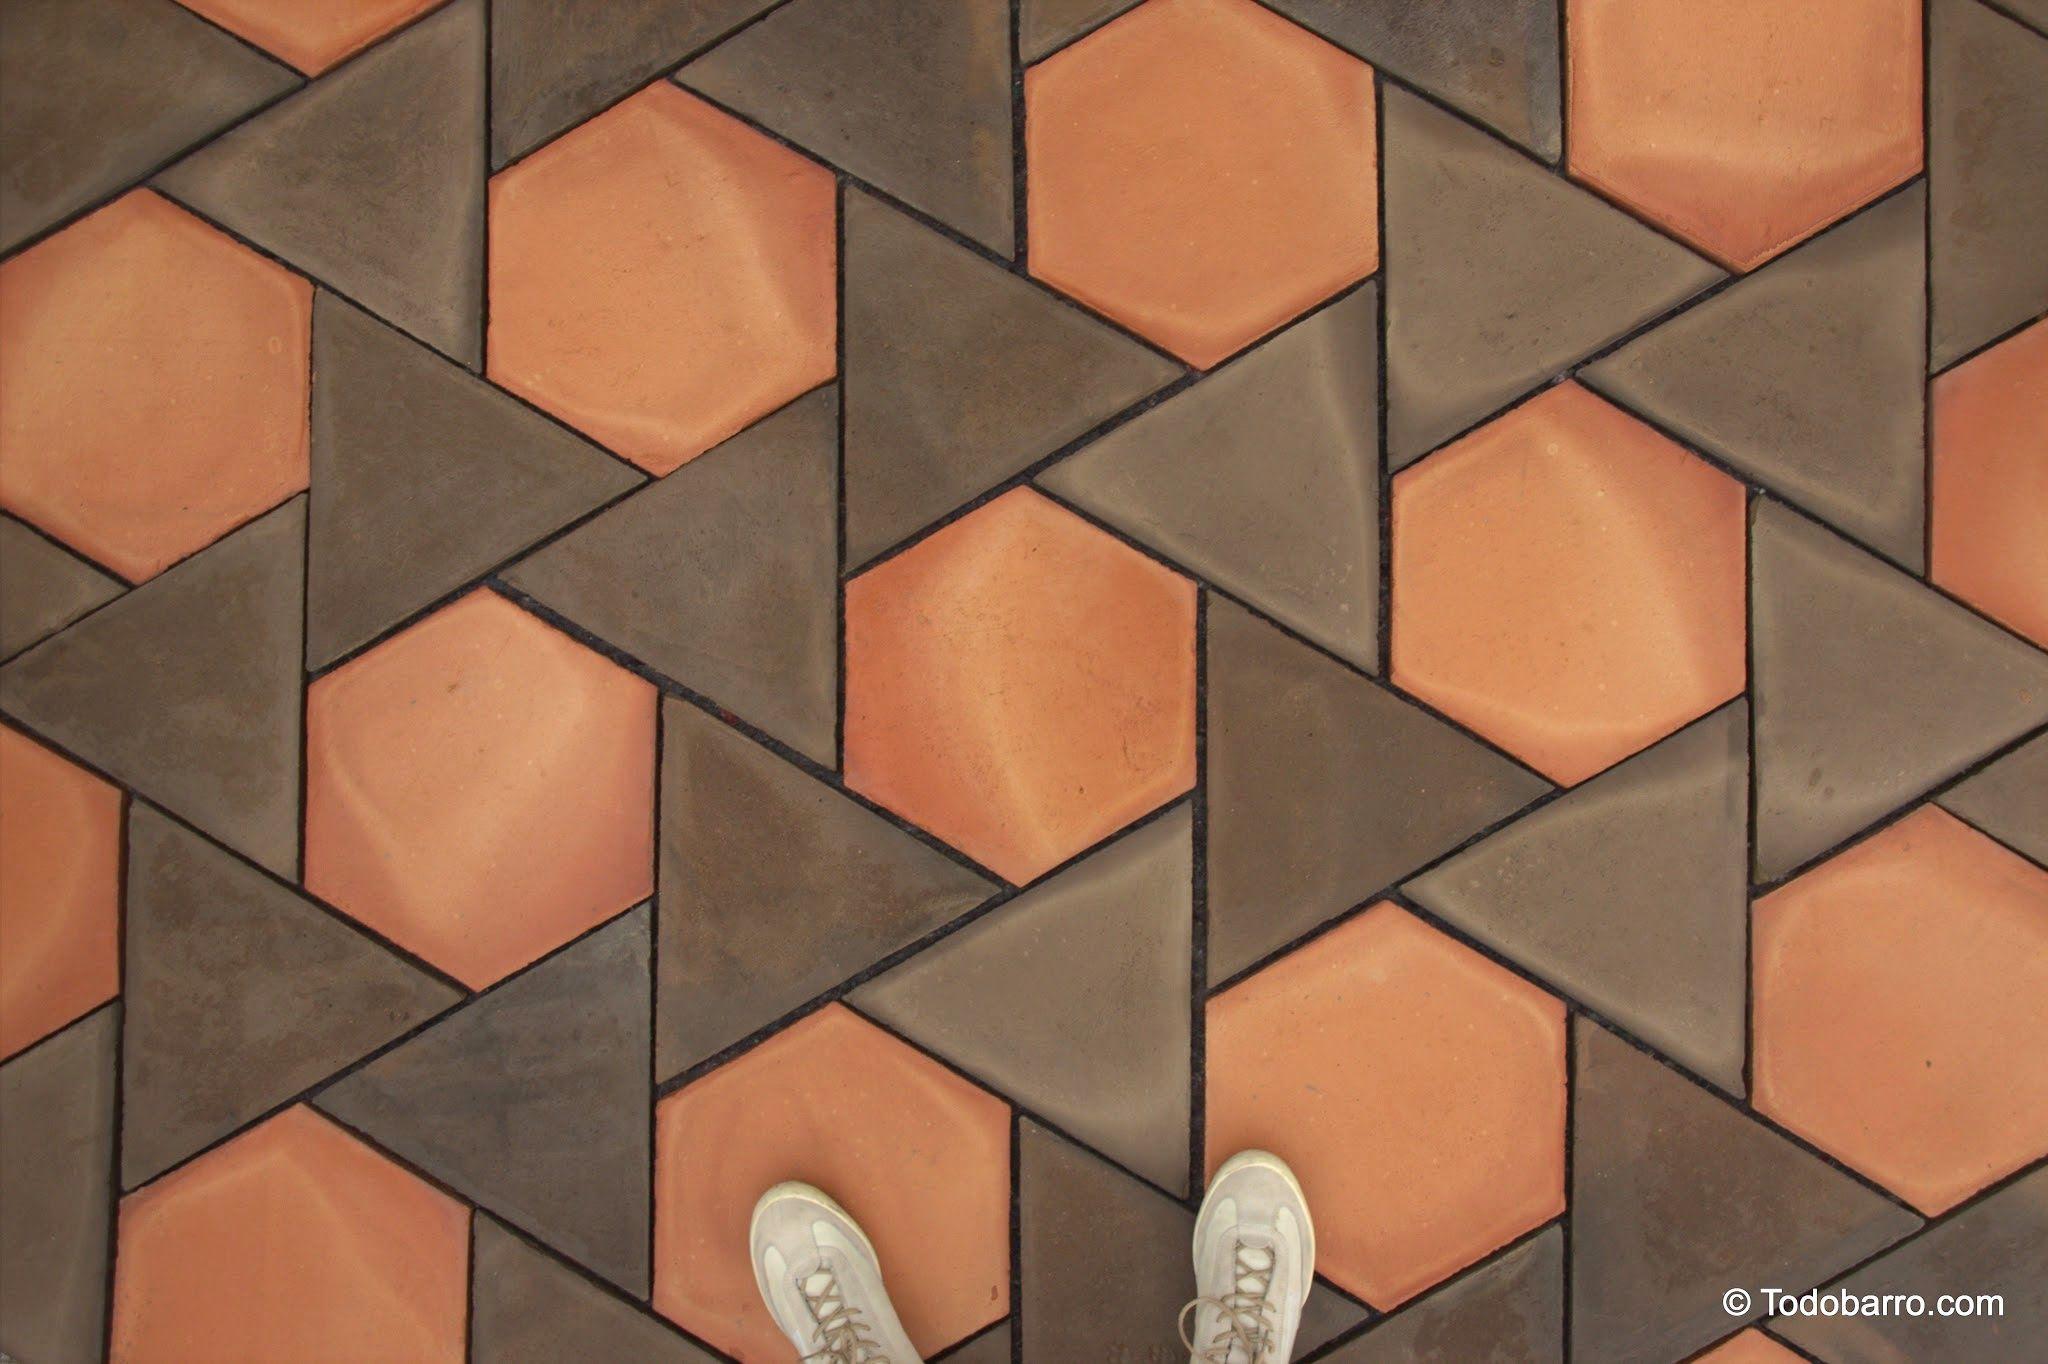 Teselado girasol spanish revival architecture terracotta floor teselado girasol spanish revival architecture terracotta floor tiles dailygadgetfo Choice Image